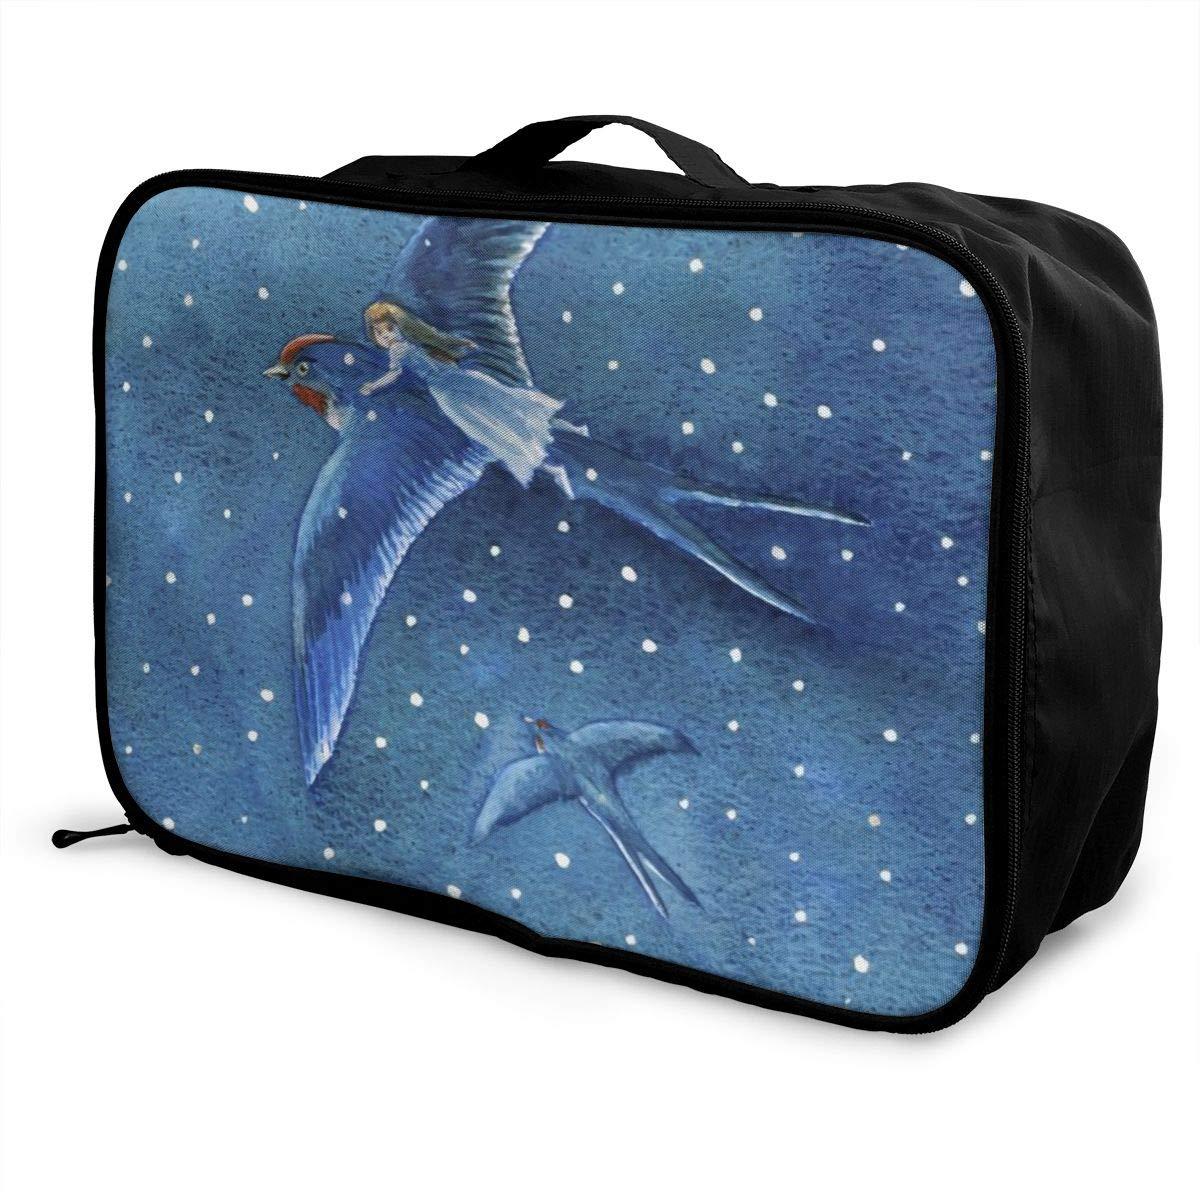 Bird Travel Duffel Bag Waterproof Fashion Unisex Lightweight Large Capacity Portable Luggage Bag for Women Men